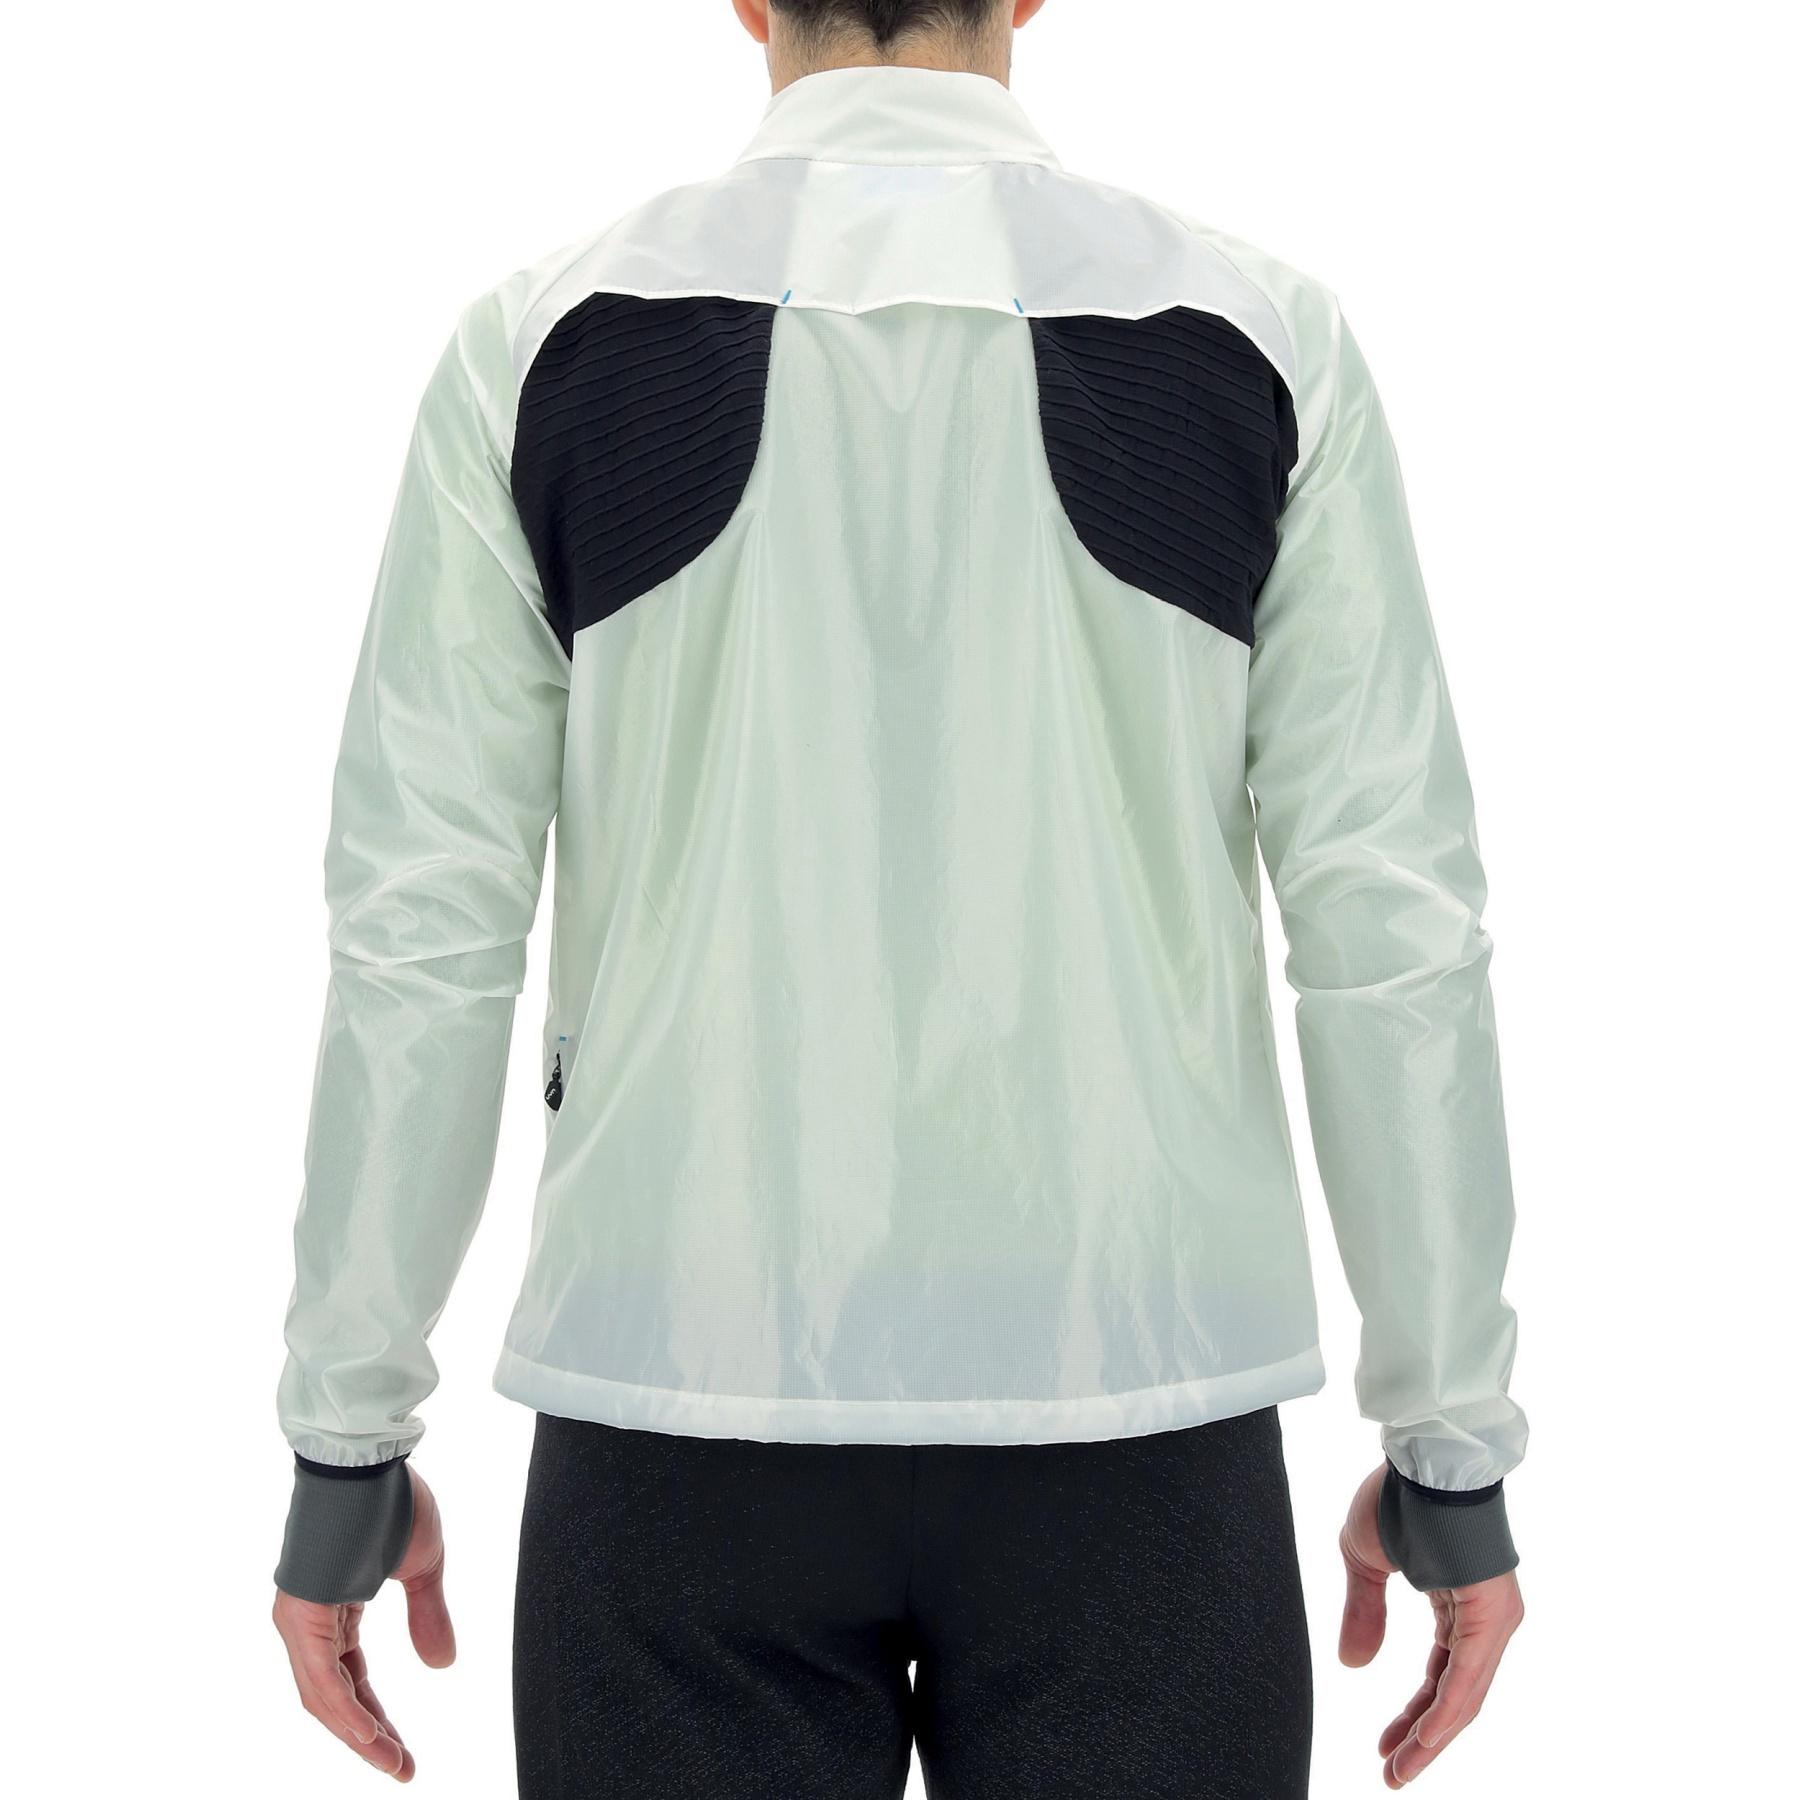 Image of UYN Running Luminance Regular Fit Jacket - Off White Plum/Black